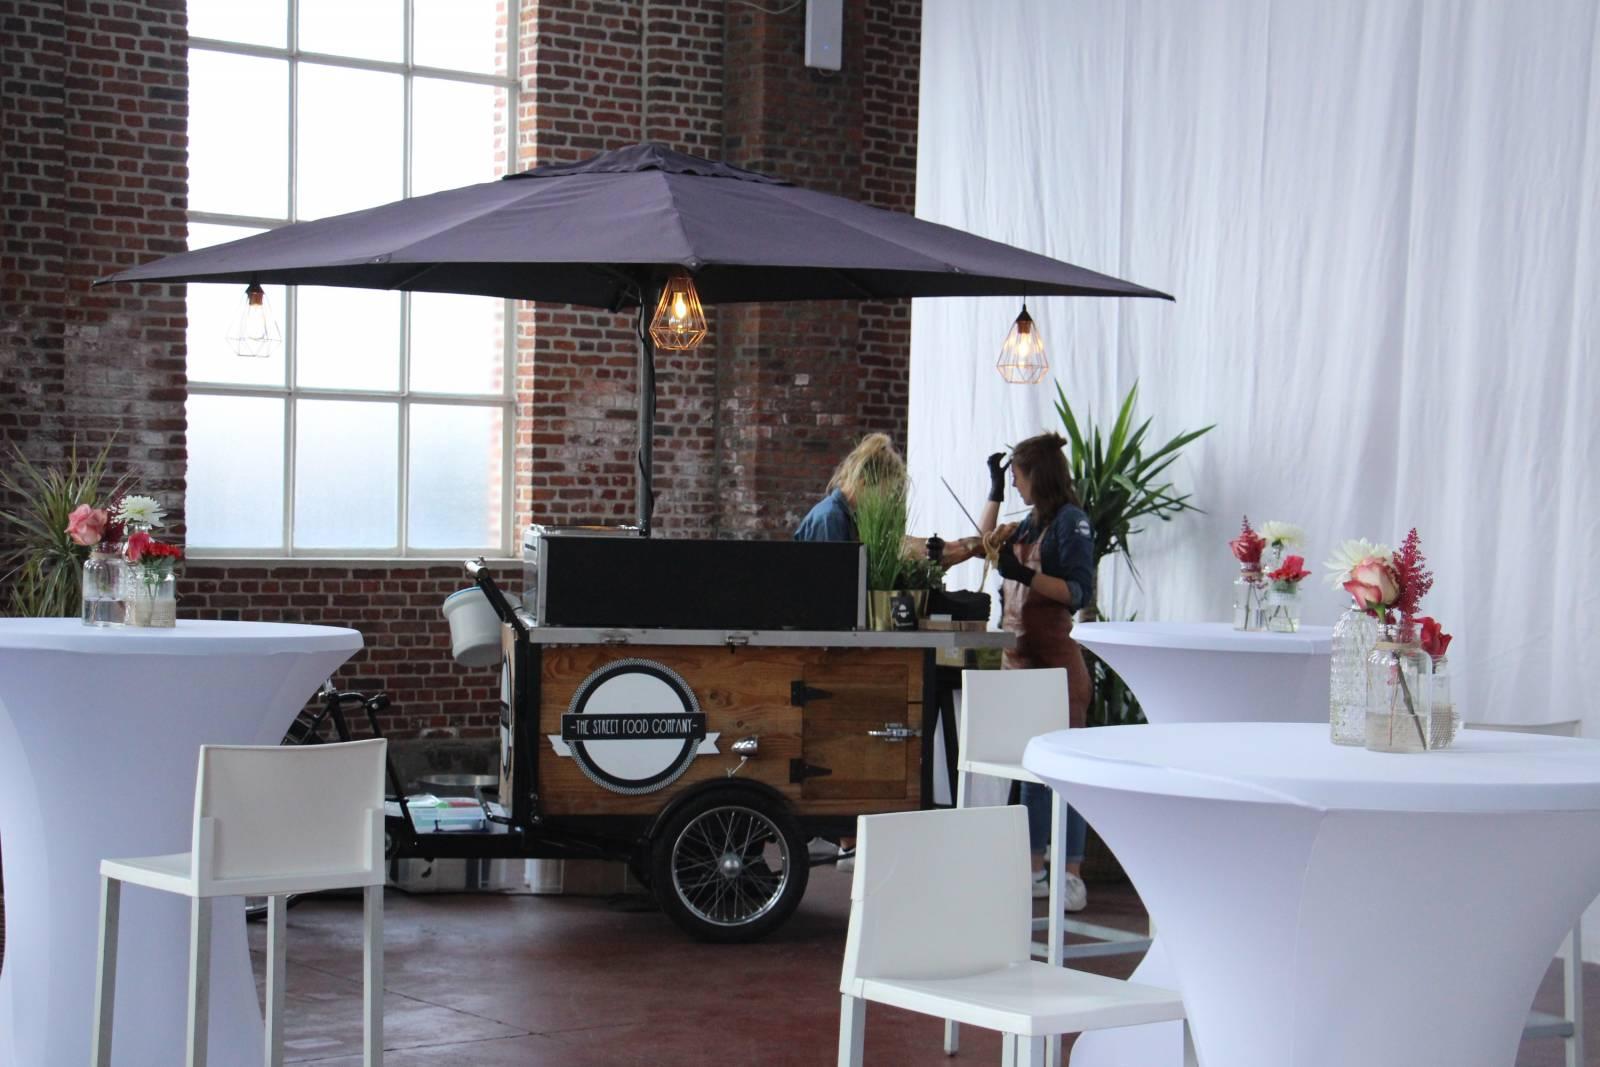 Hangar 43 - Feestzaal Oost-Vlaanderen - Industrieel - House of Weddings - 31